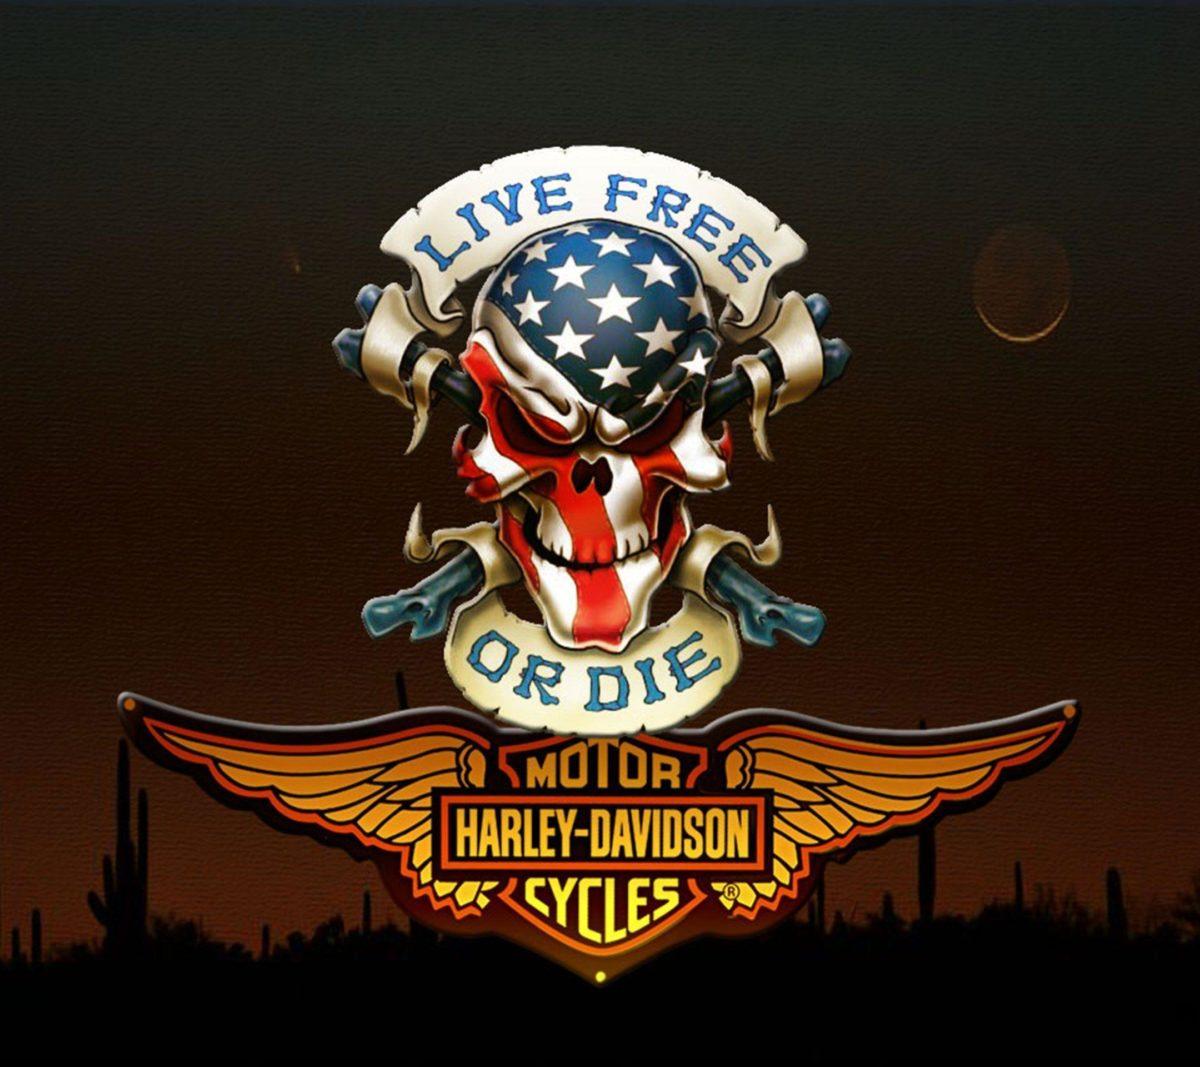 Harley Davidson Logo Wallpaper Hd Cool 7 HD Wallpapers | isghd.